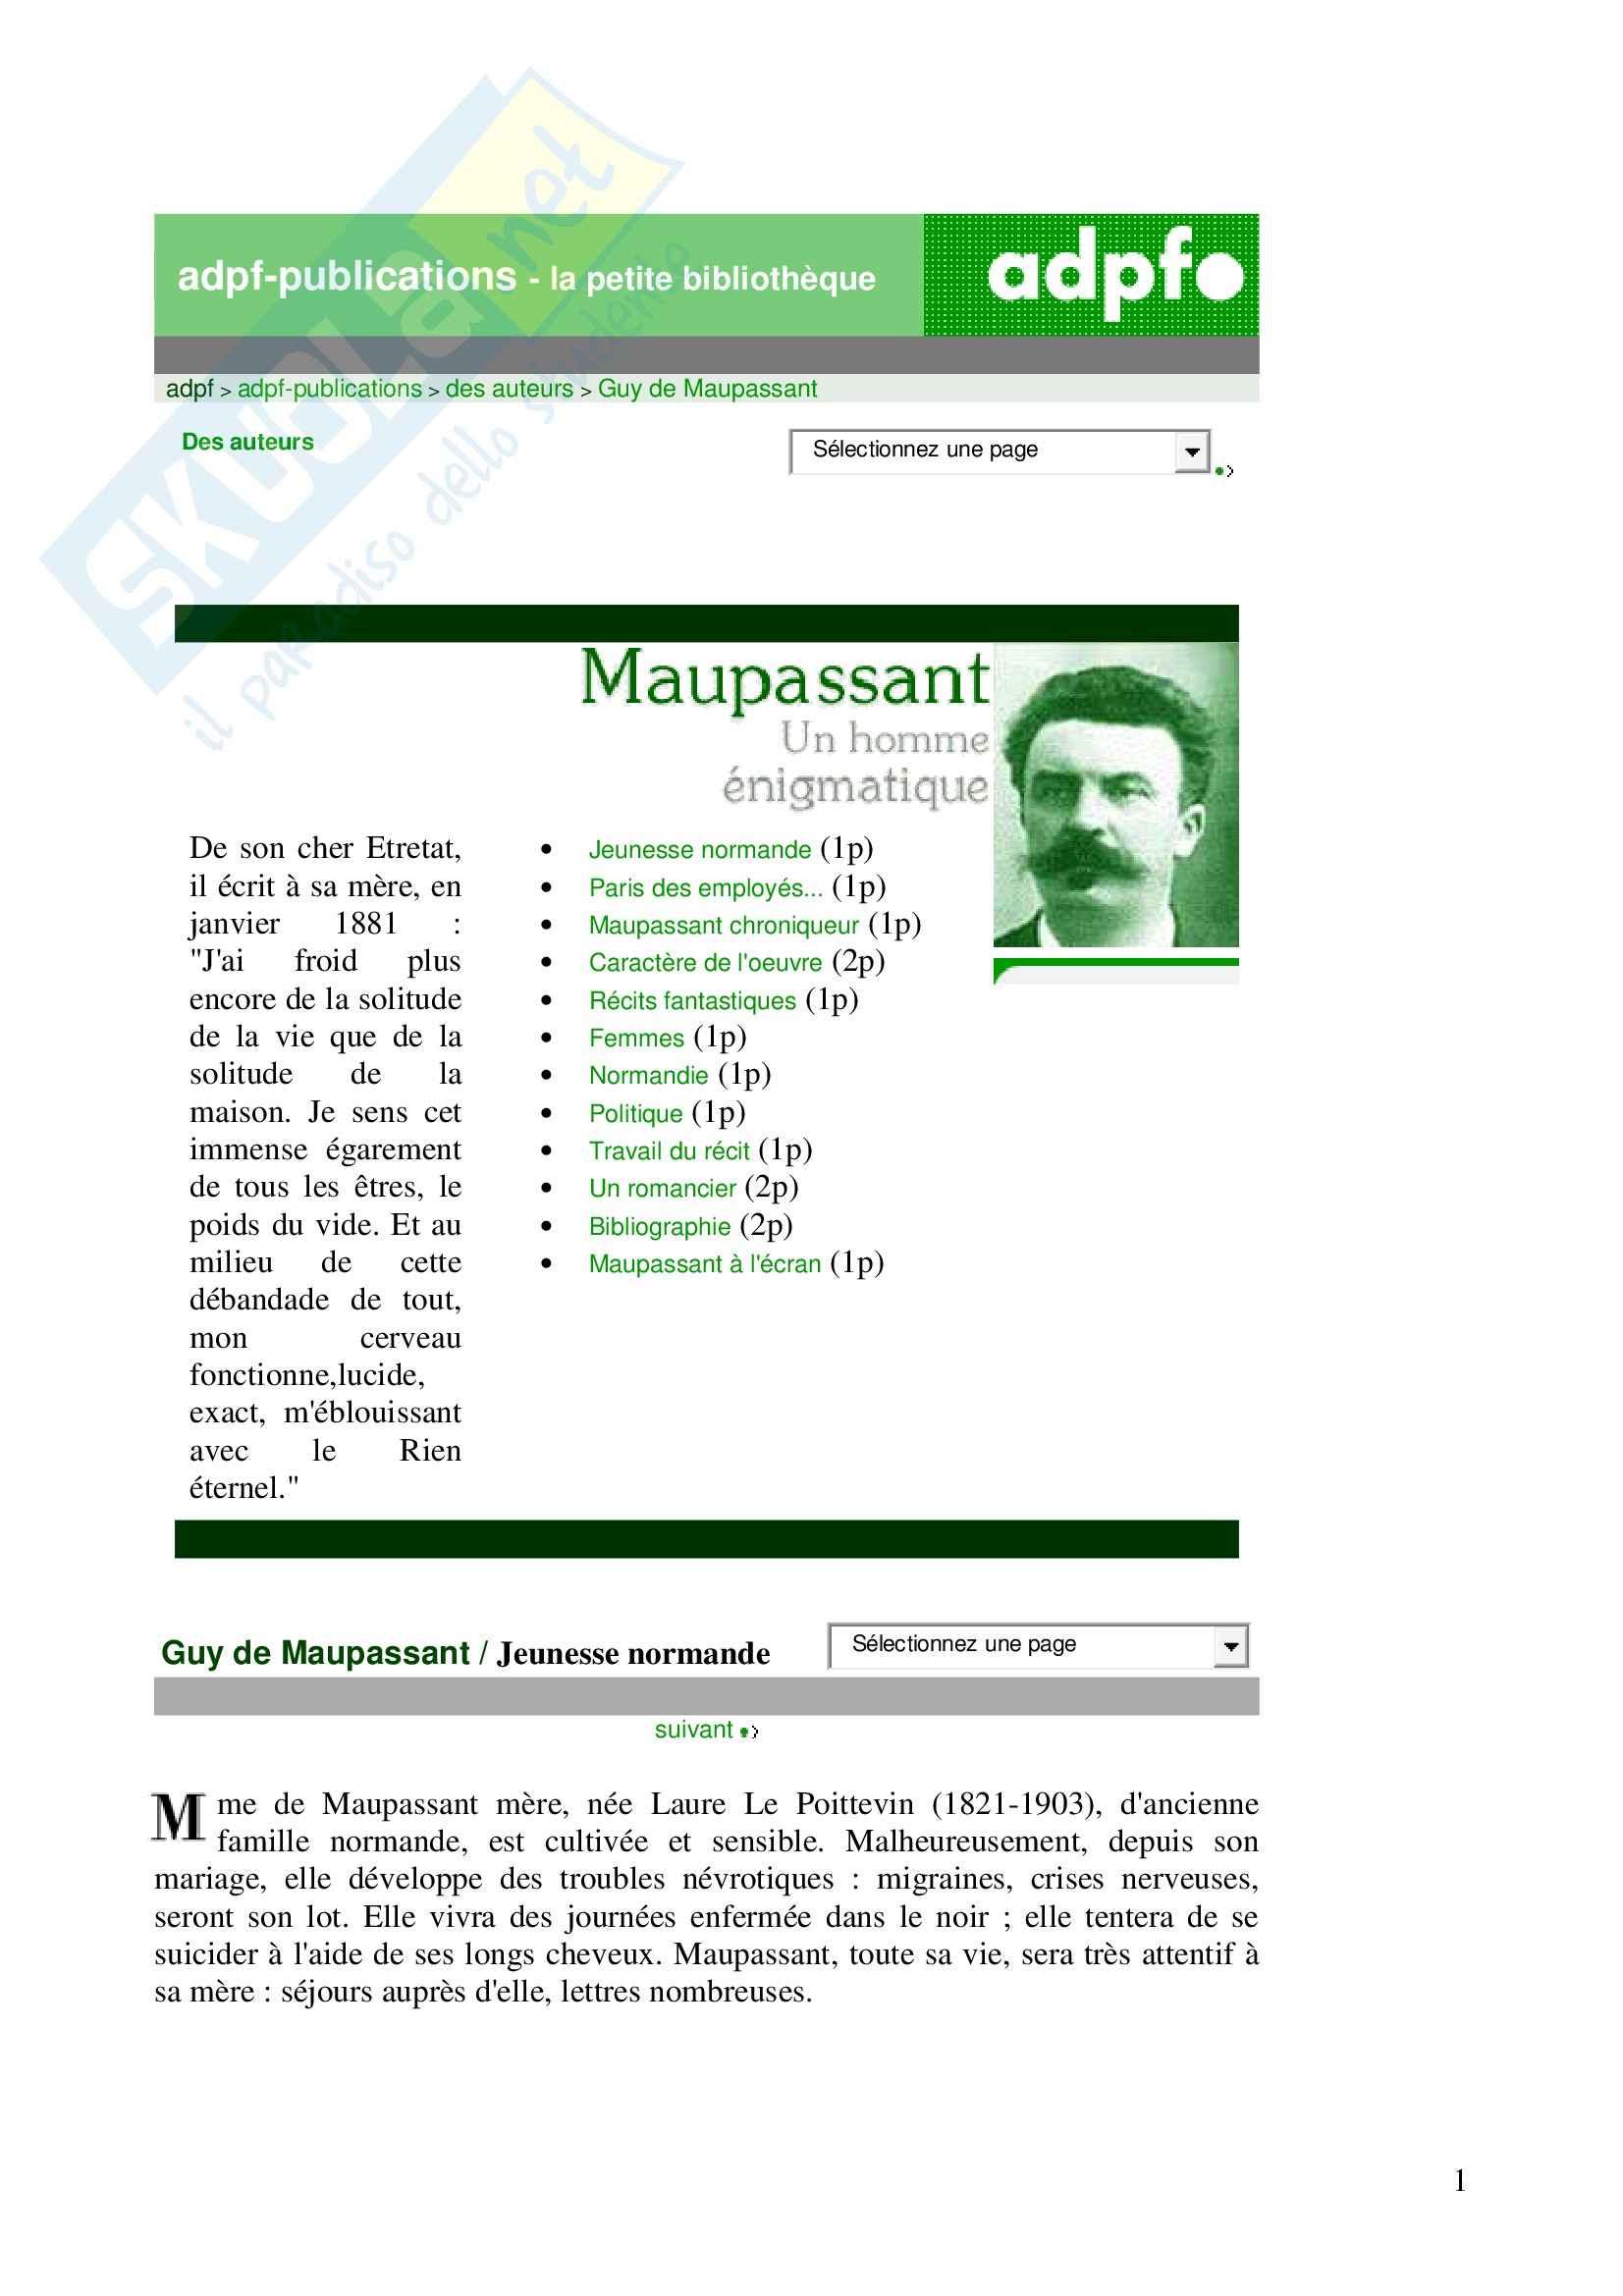 Maupassant